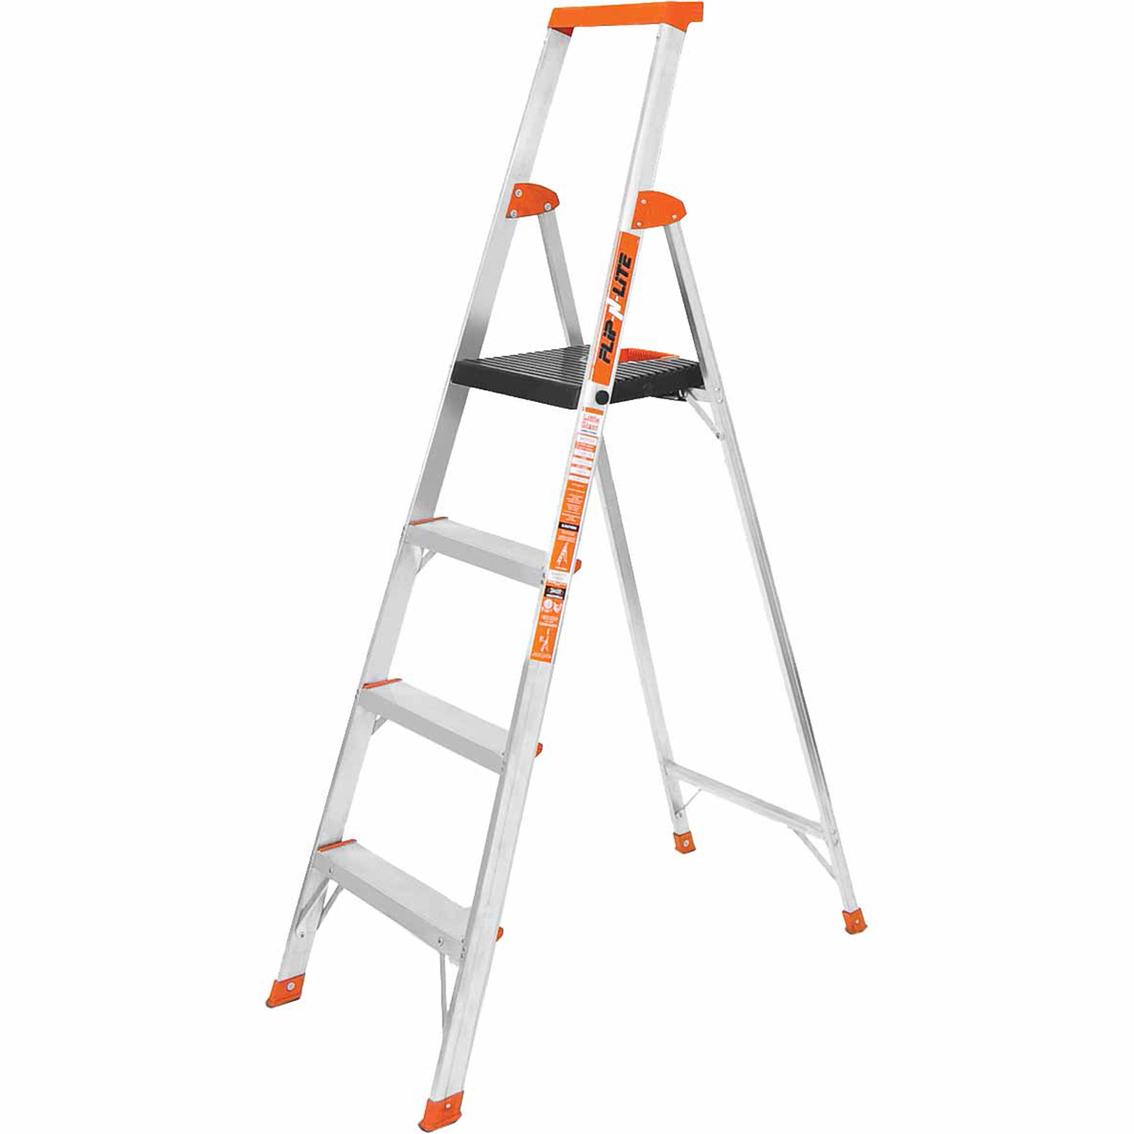 Little Giant Ladders 6 Ft Type 1a Flip N Lite Stepladder Stepladders Patio Garden Garage Shop The Exchange